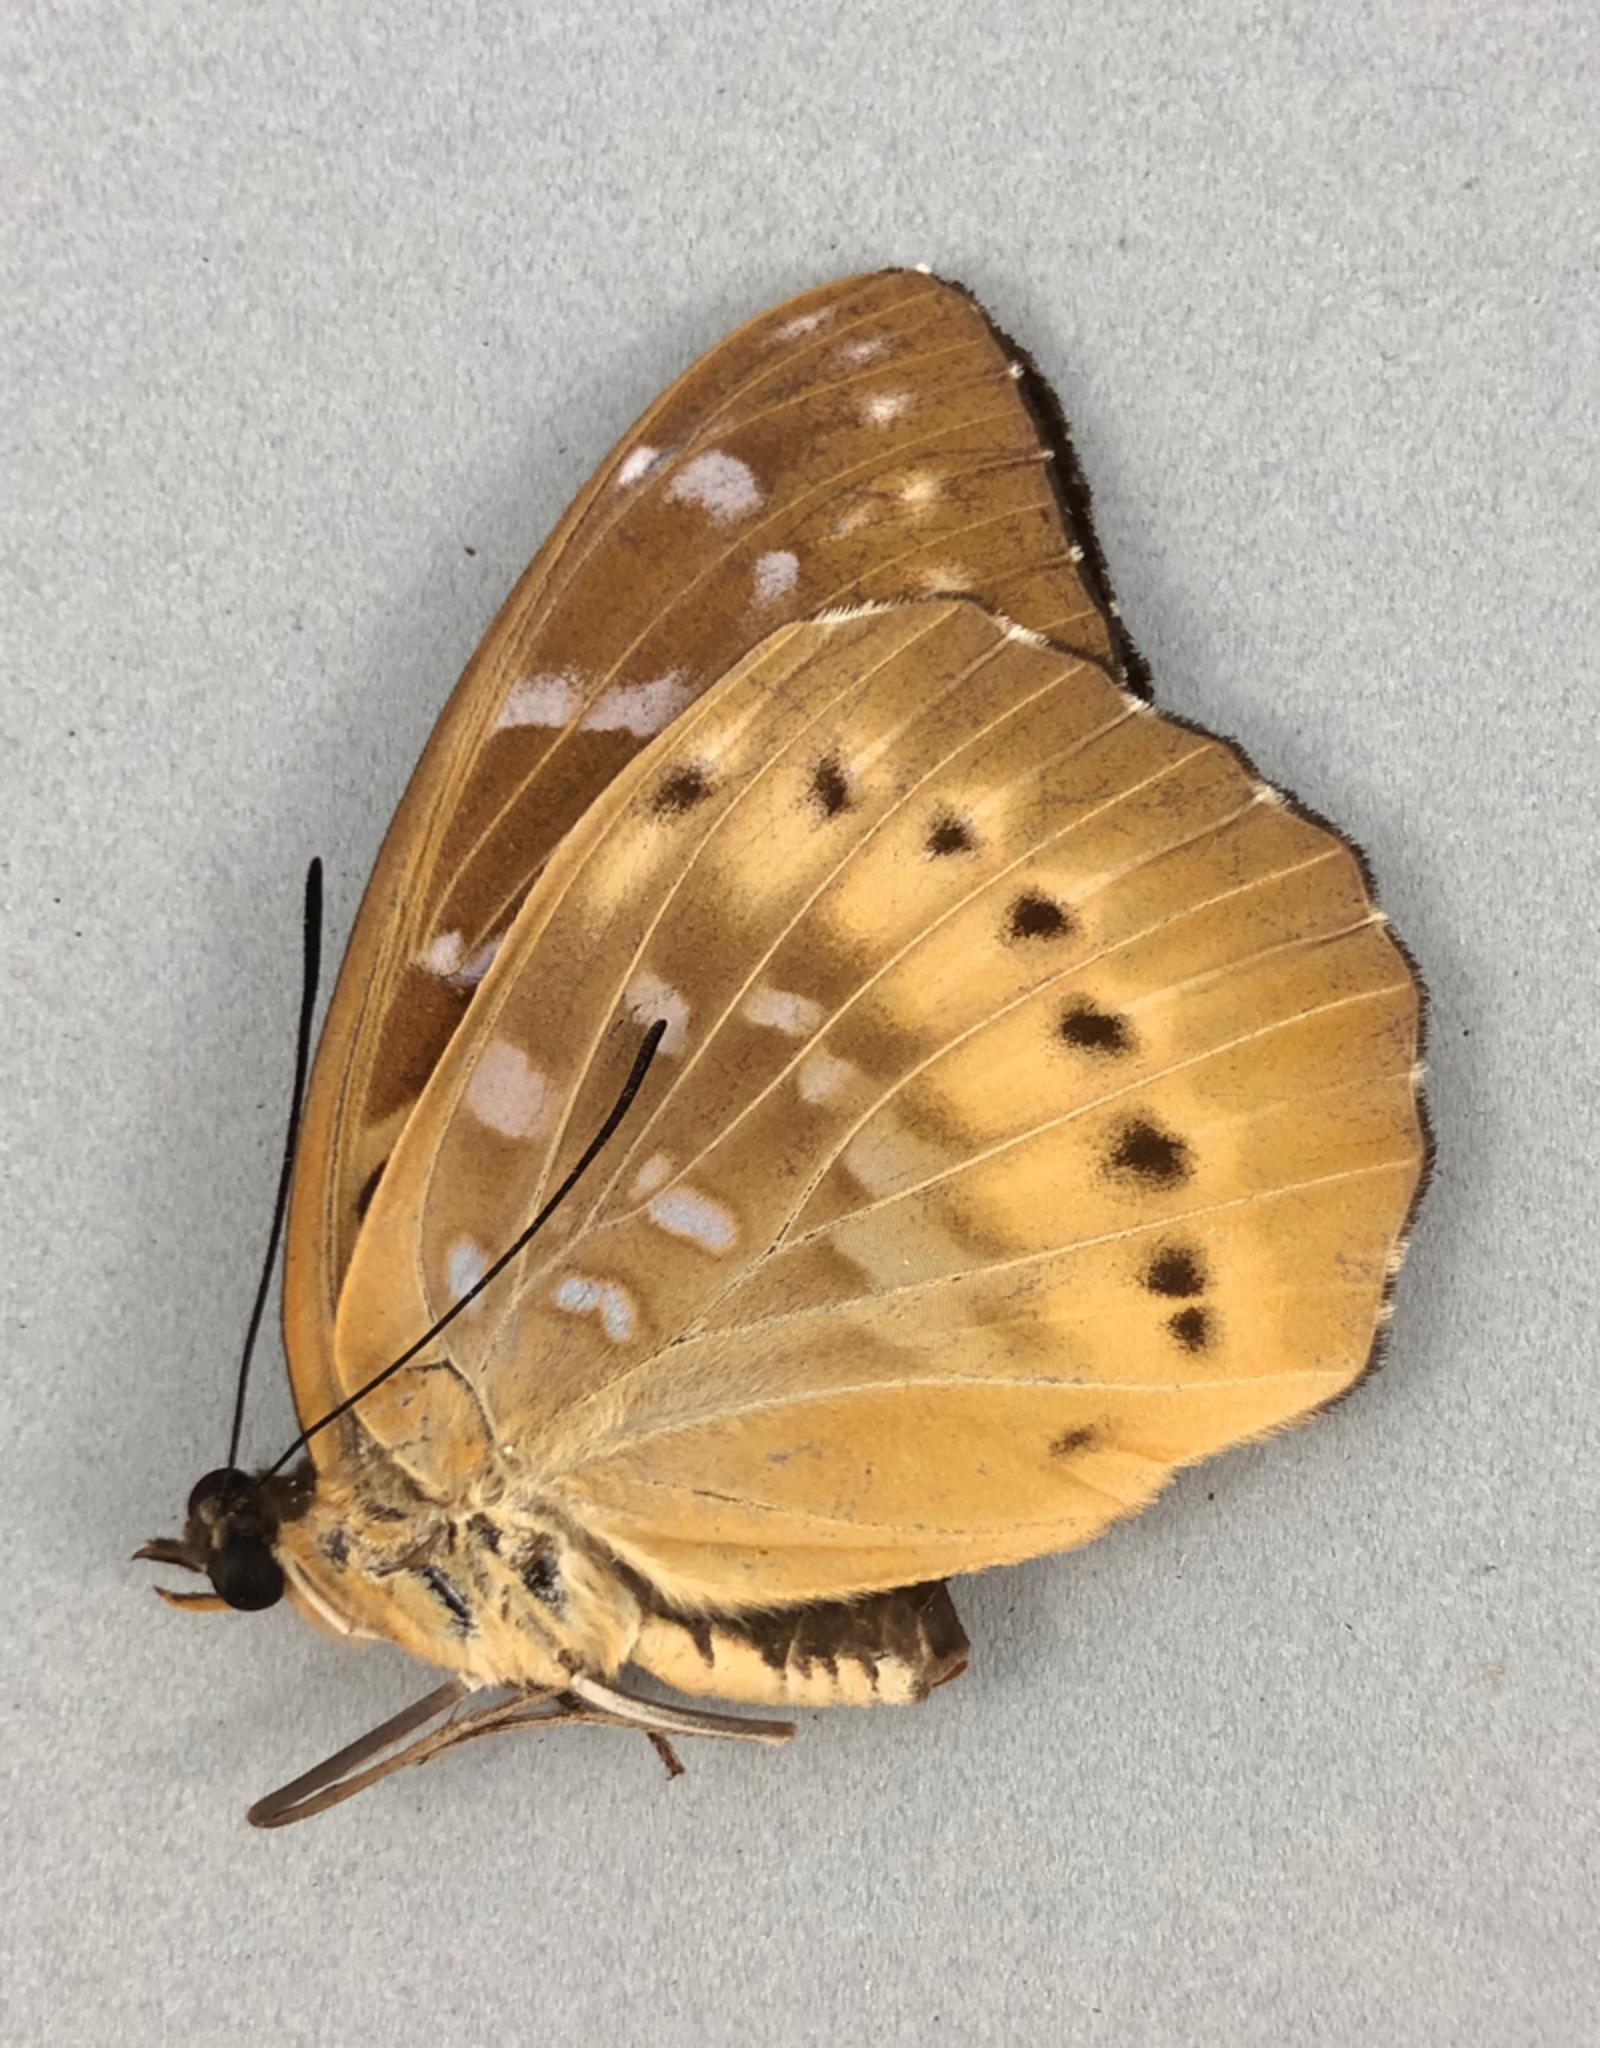 Lexias panopus boholensis F A1 Philippines